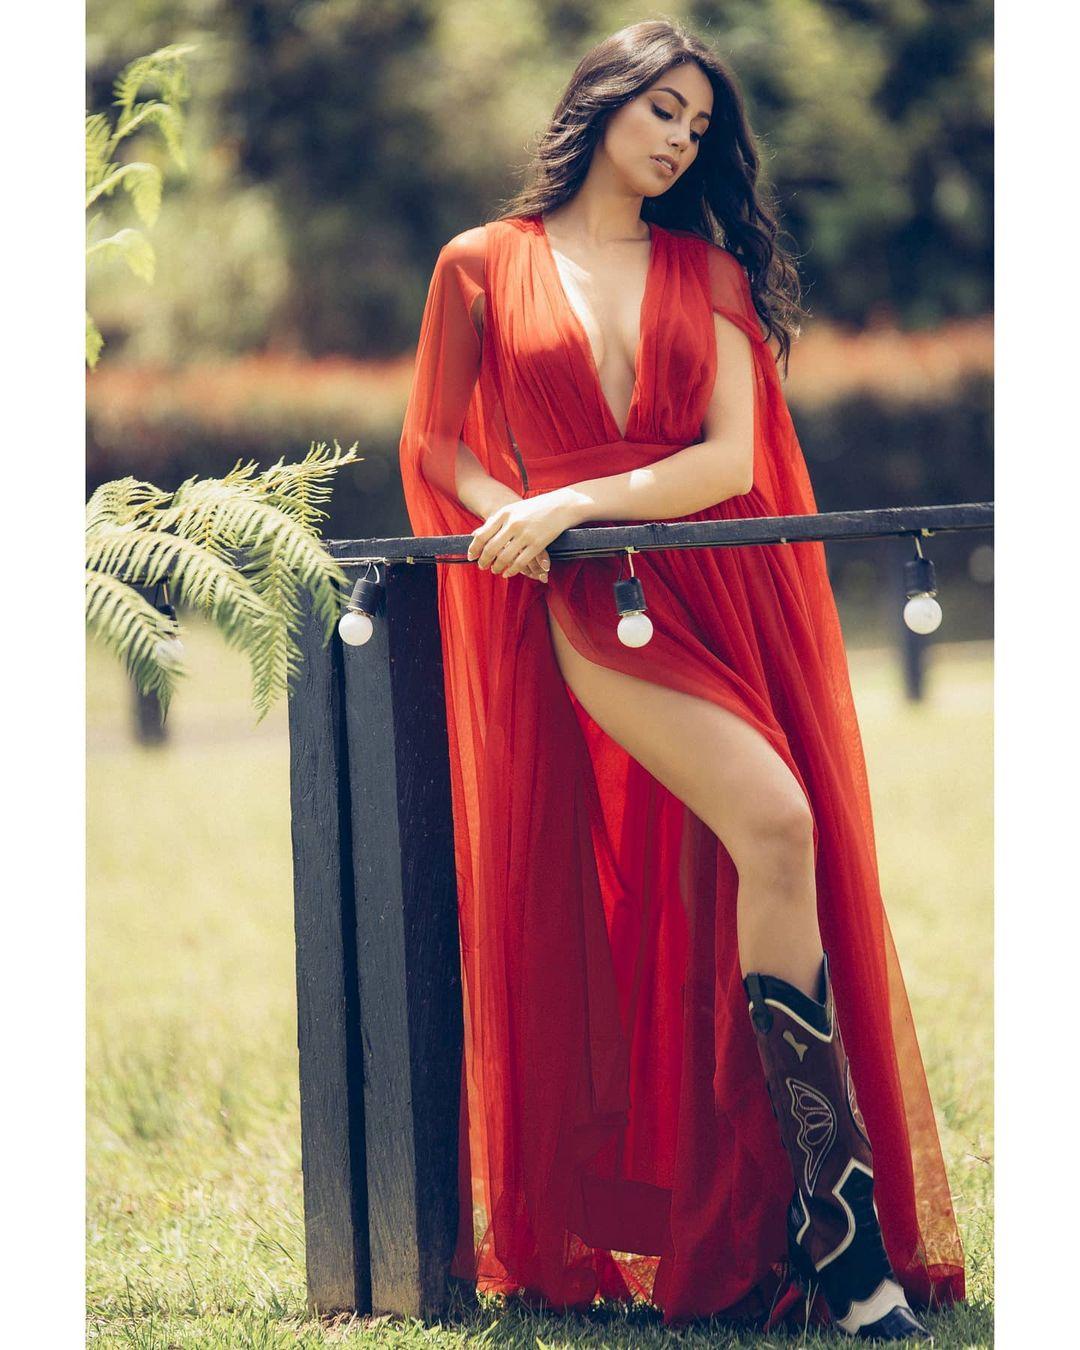 andrea aguilera, miss world colombia 2021. - Página 4 22907611